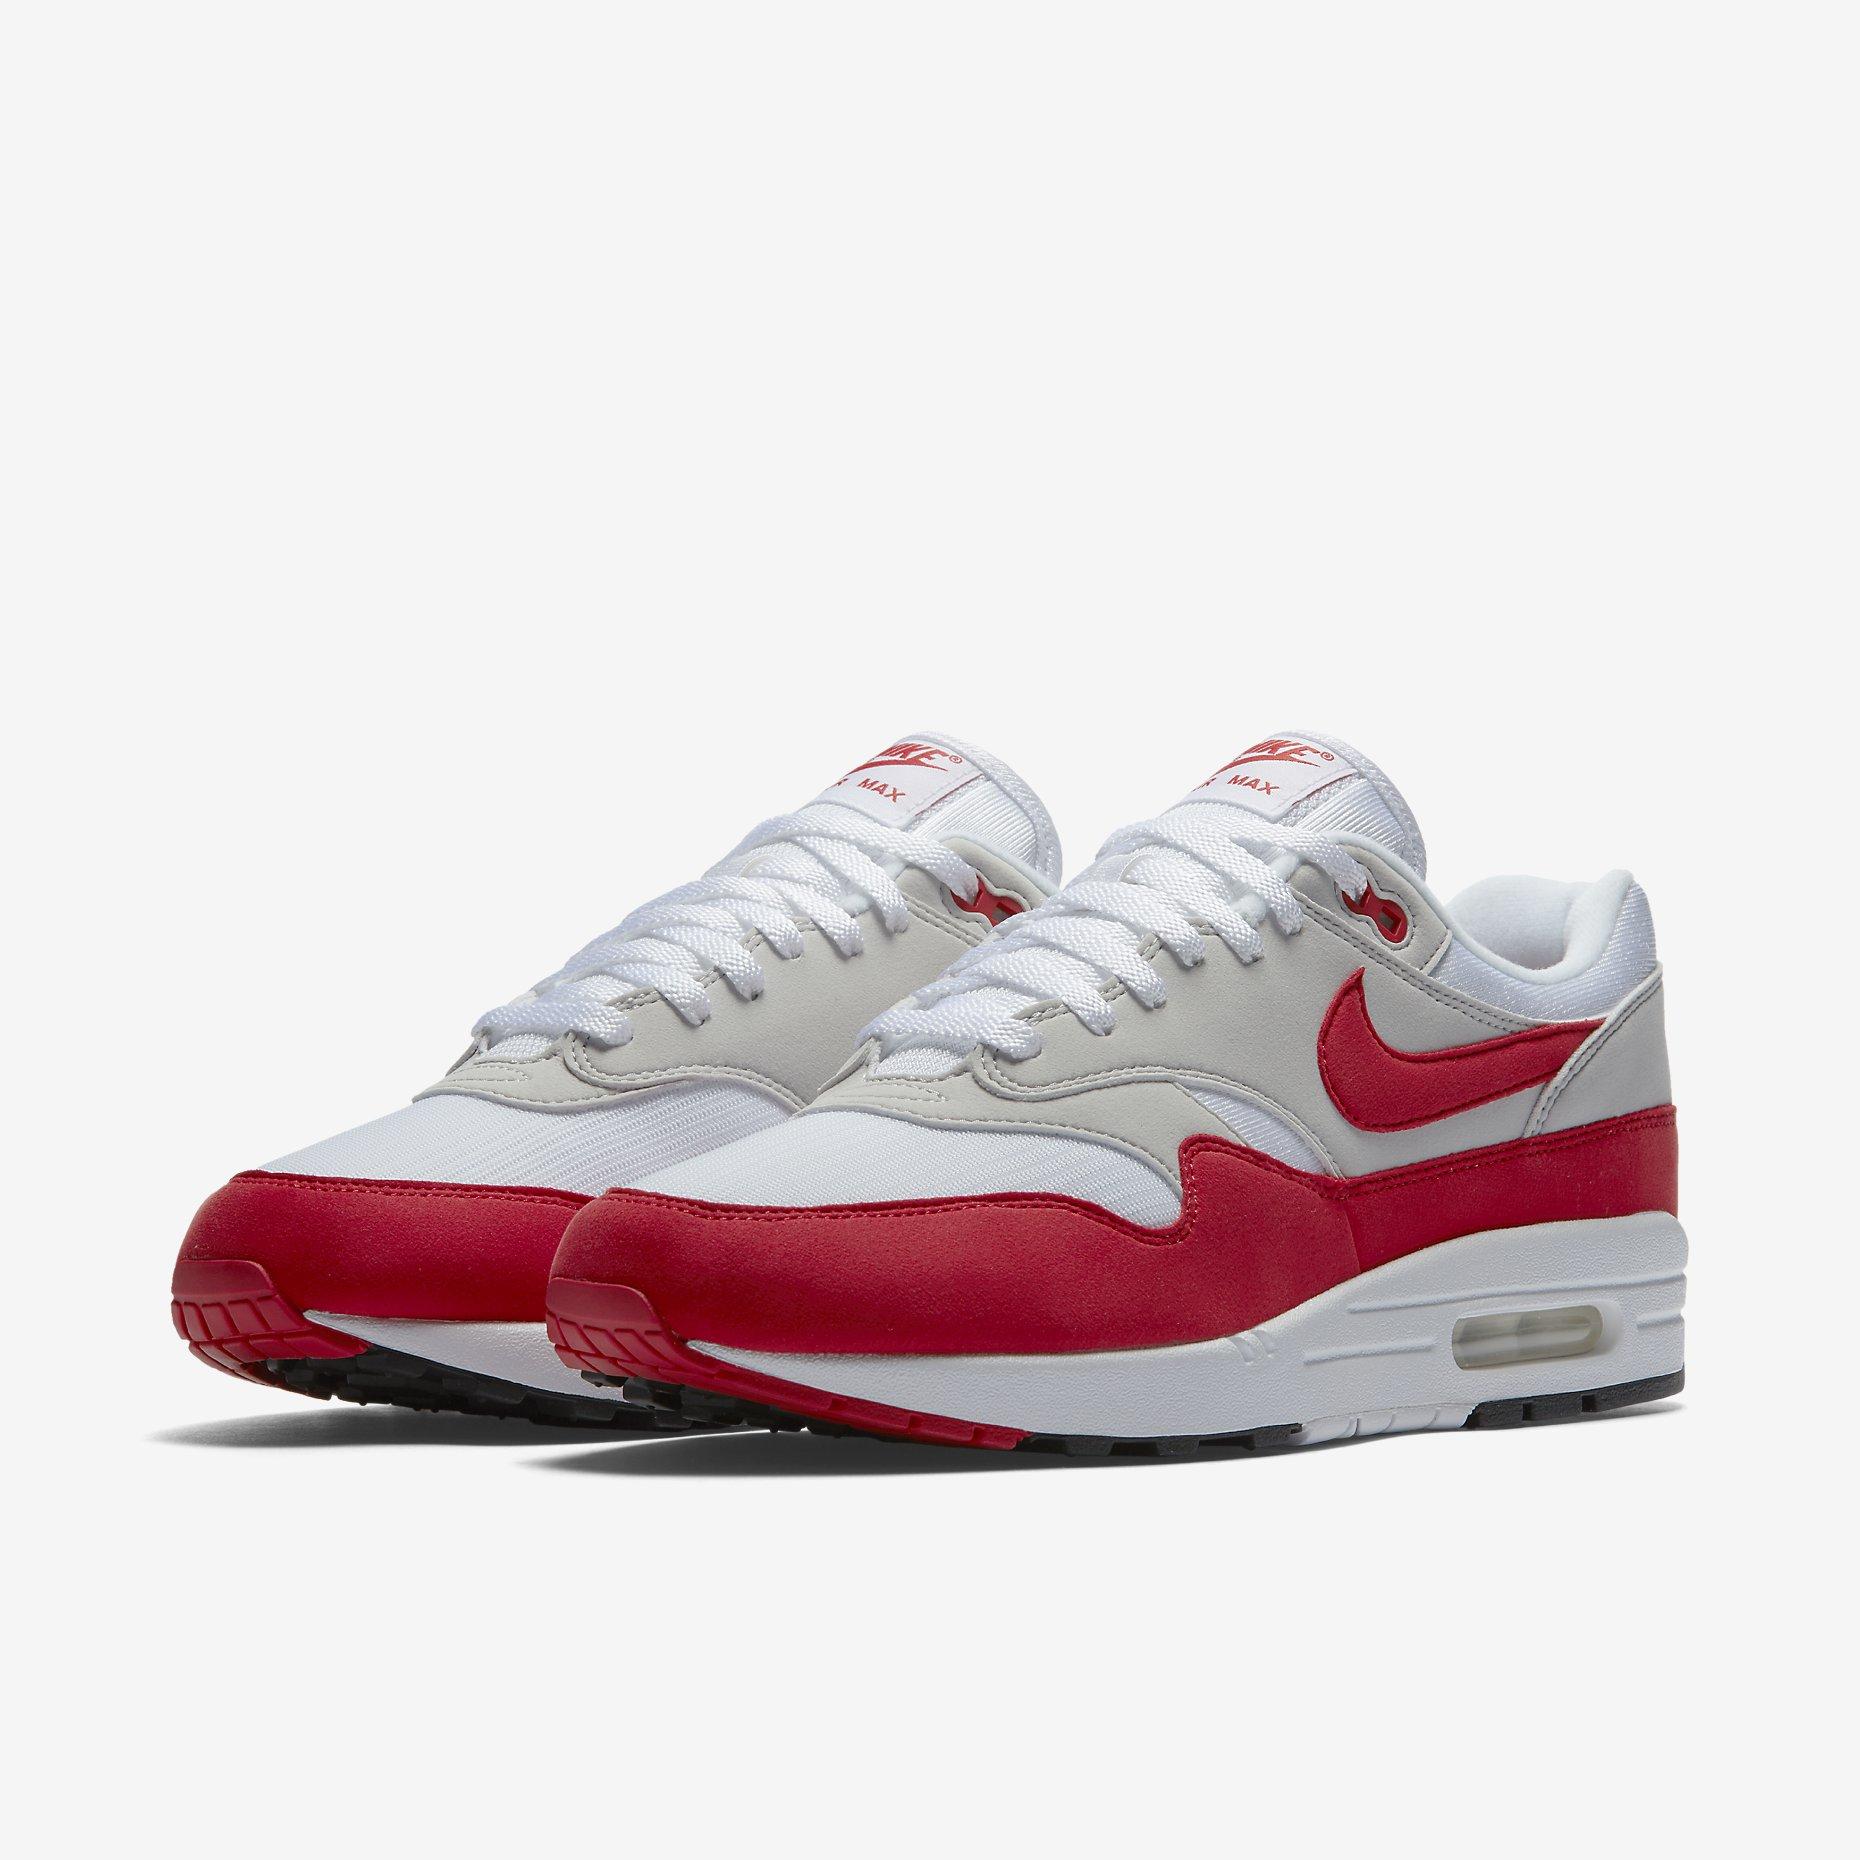 Nike Air Max 1 OG « Anniversary Red »